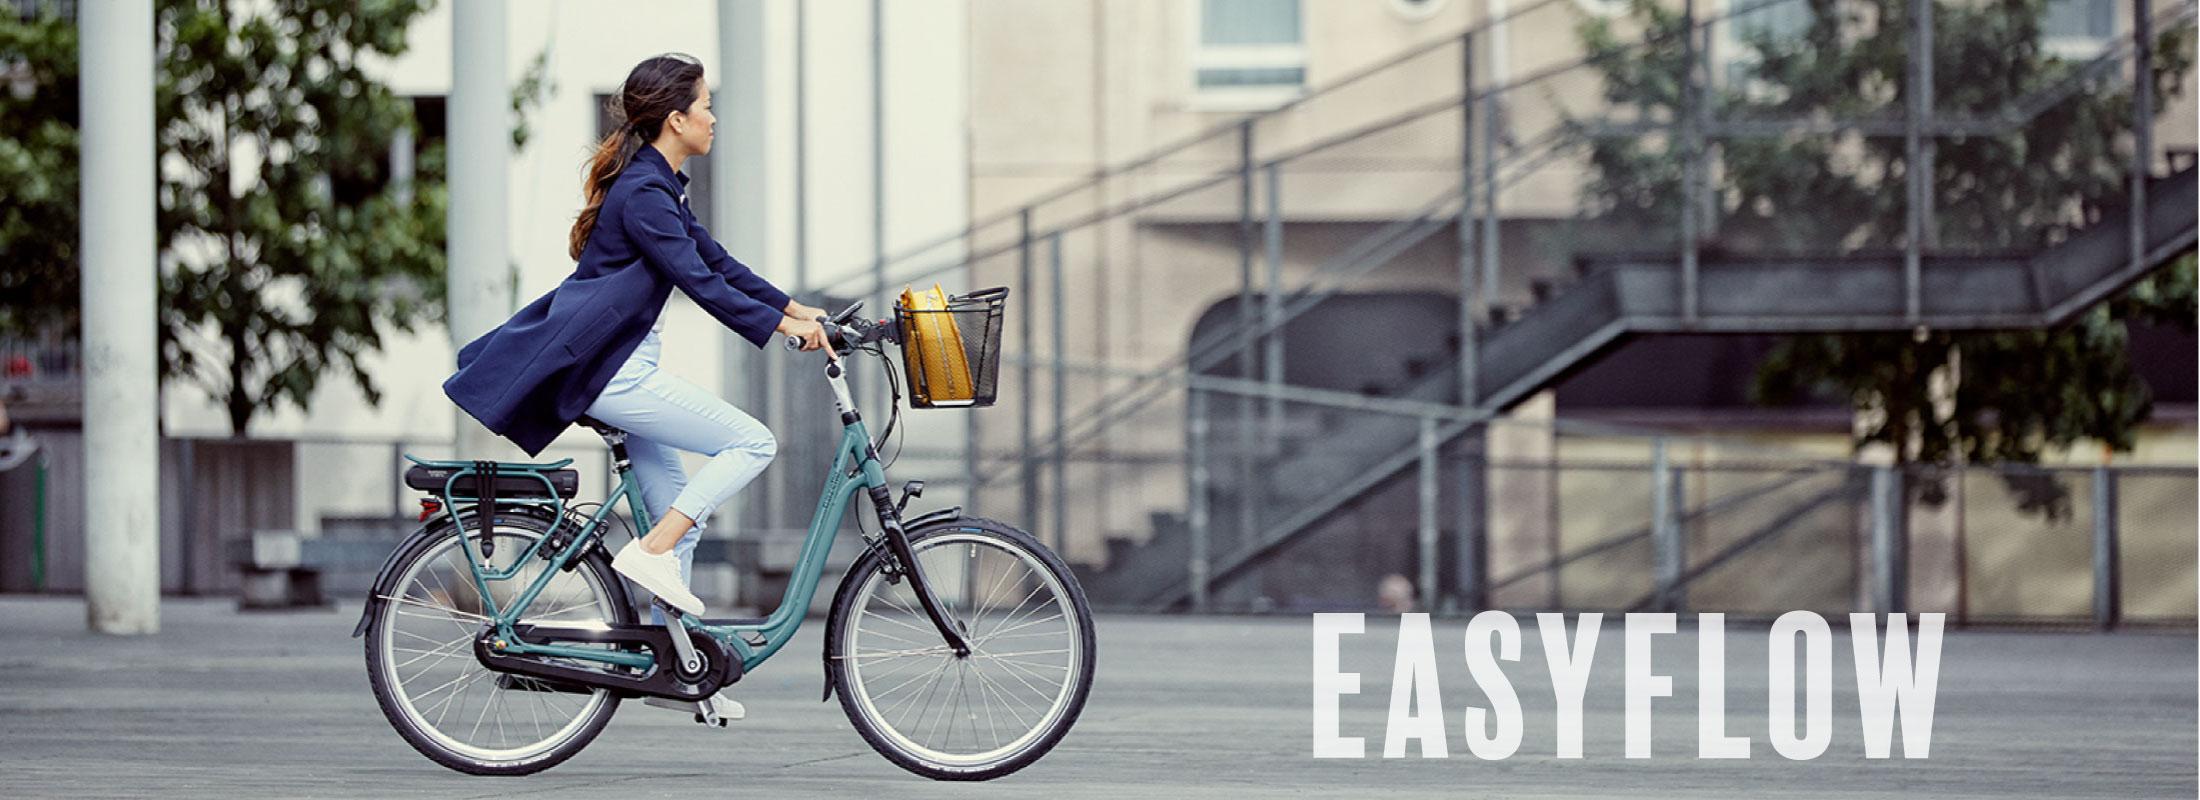 Gazelle EasyFlow | The Garage OTR